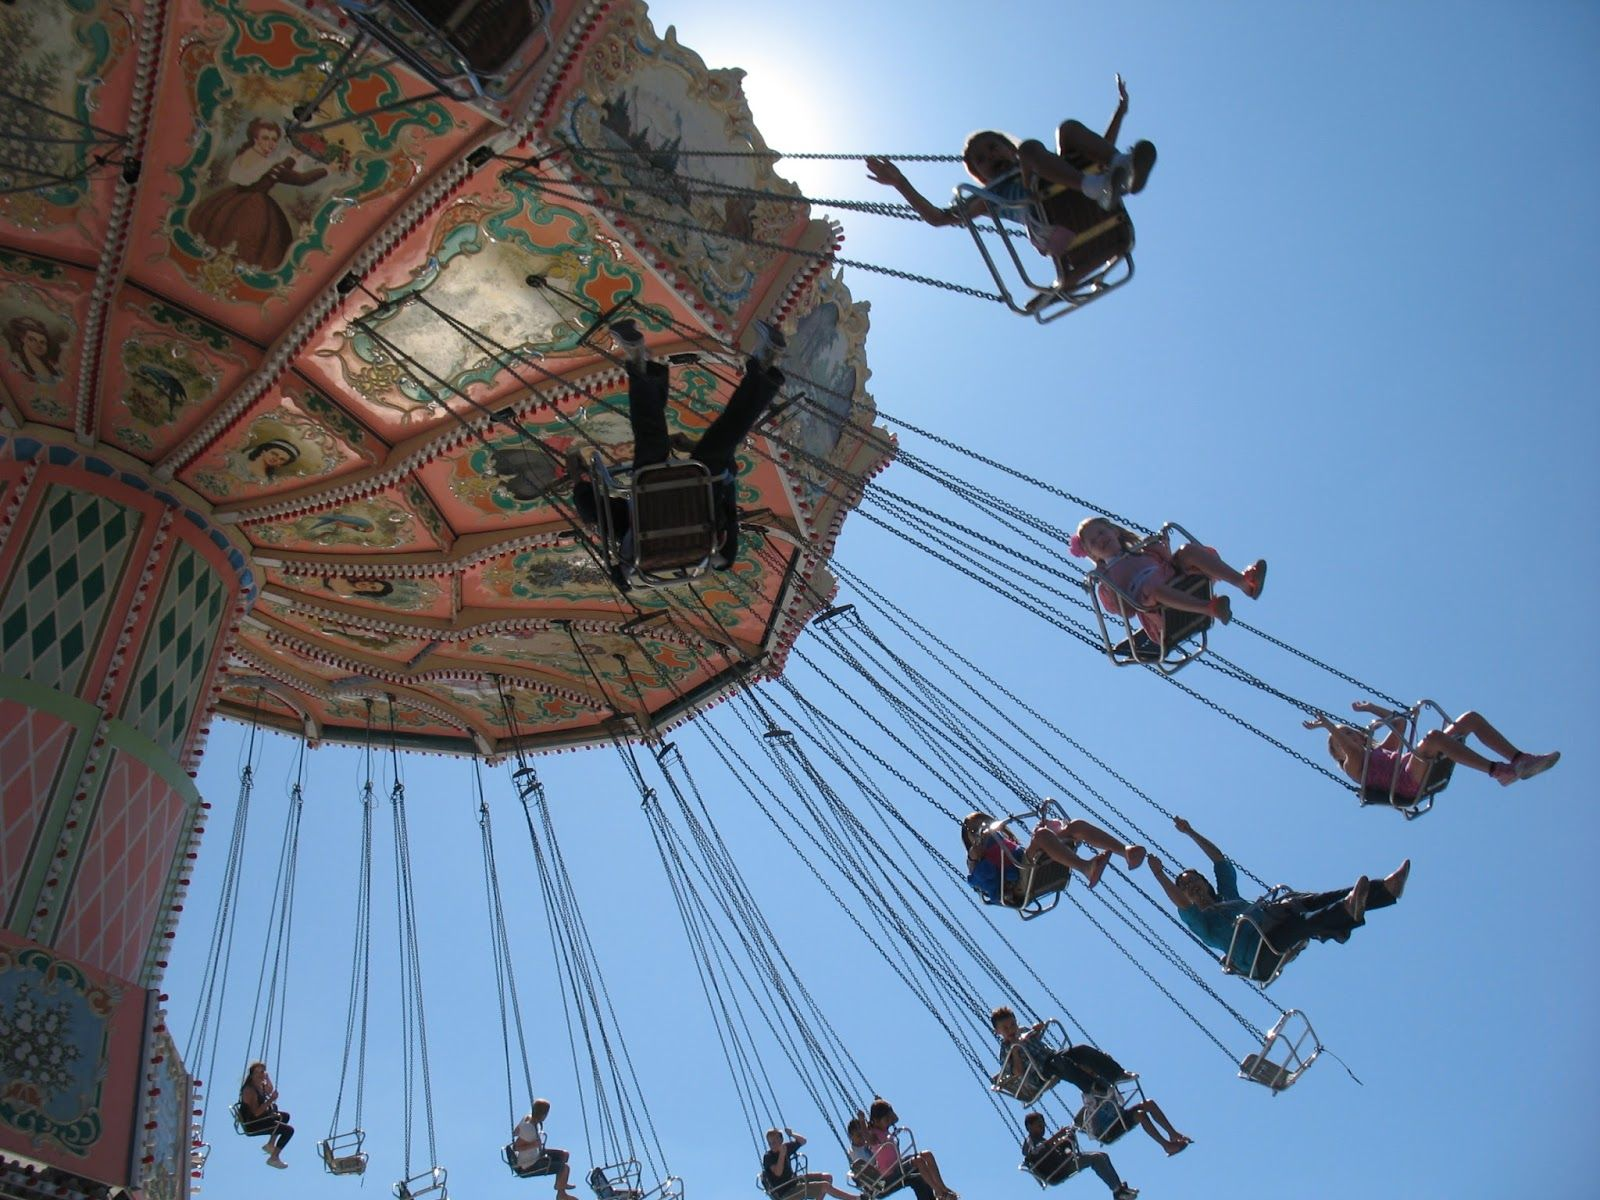 san diego county fair costco has san diego county del mar fair ticket packages - Del Mar Fair Halloween